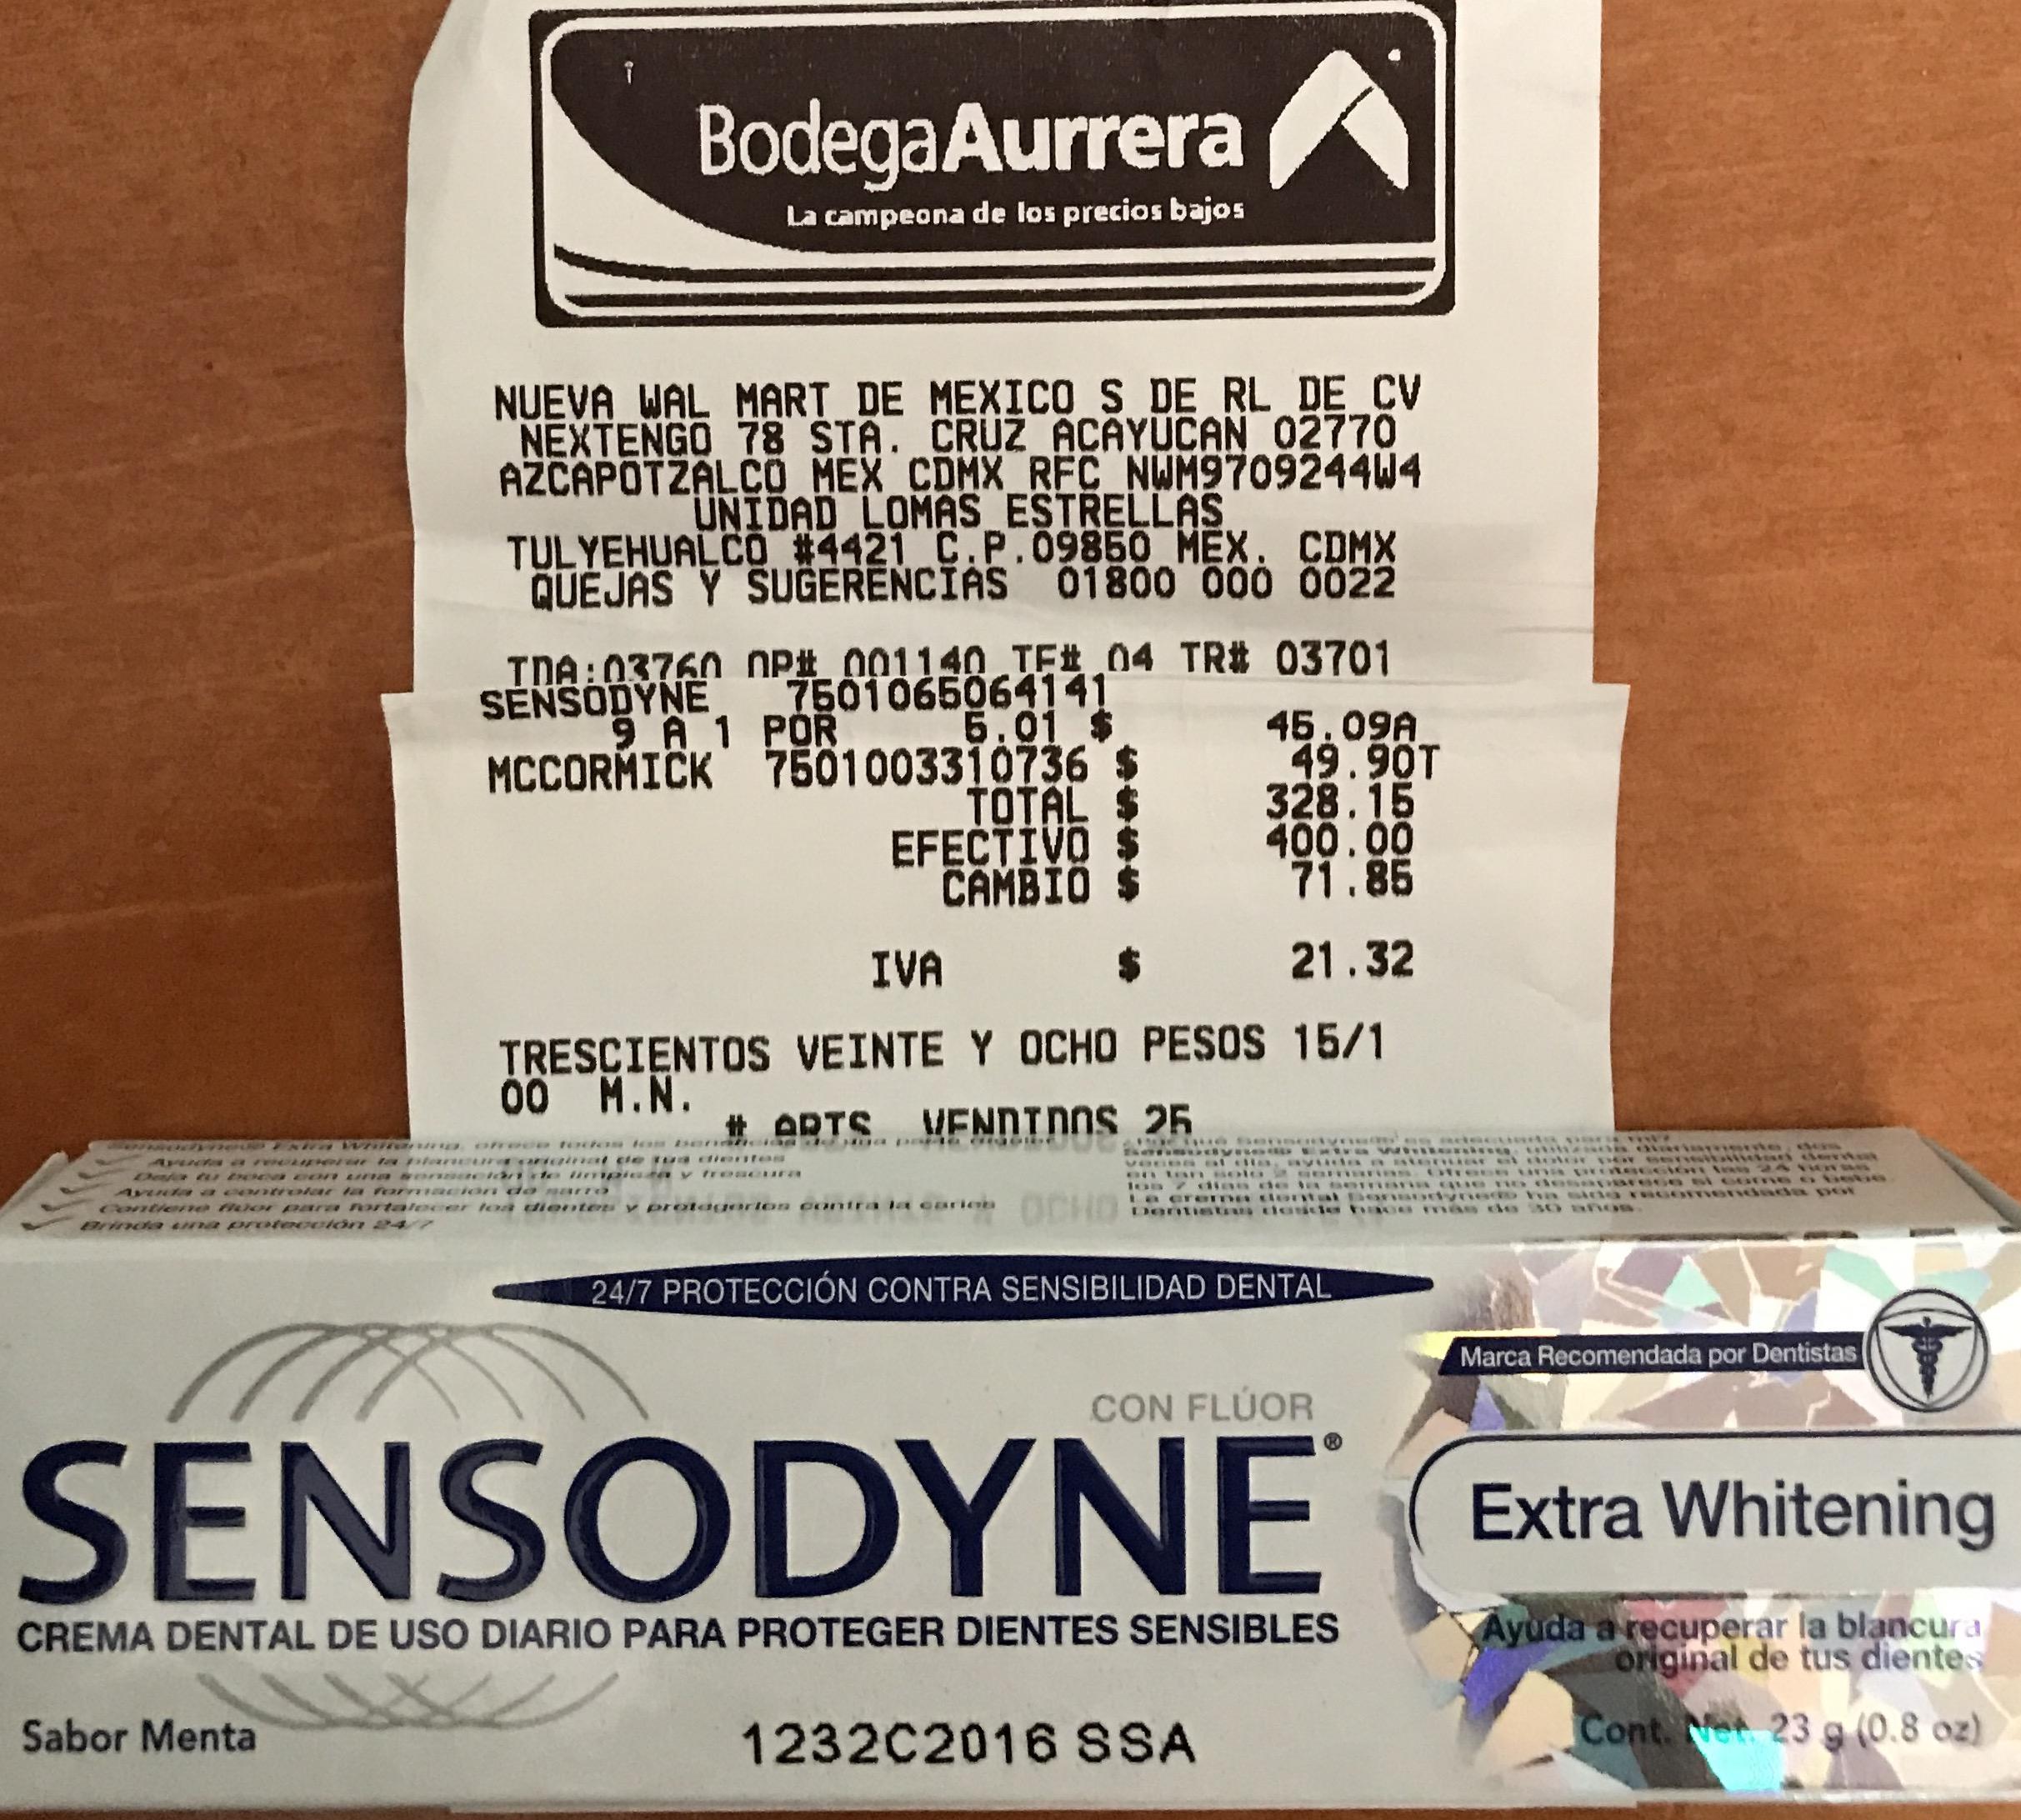 Bodega Aurrerá: crema dental sensodyne a $5.01